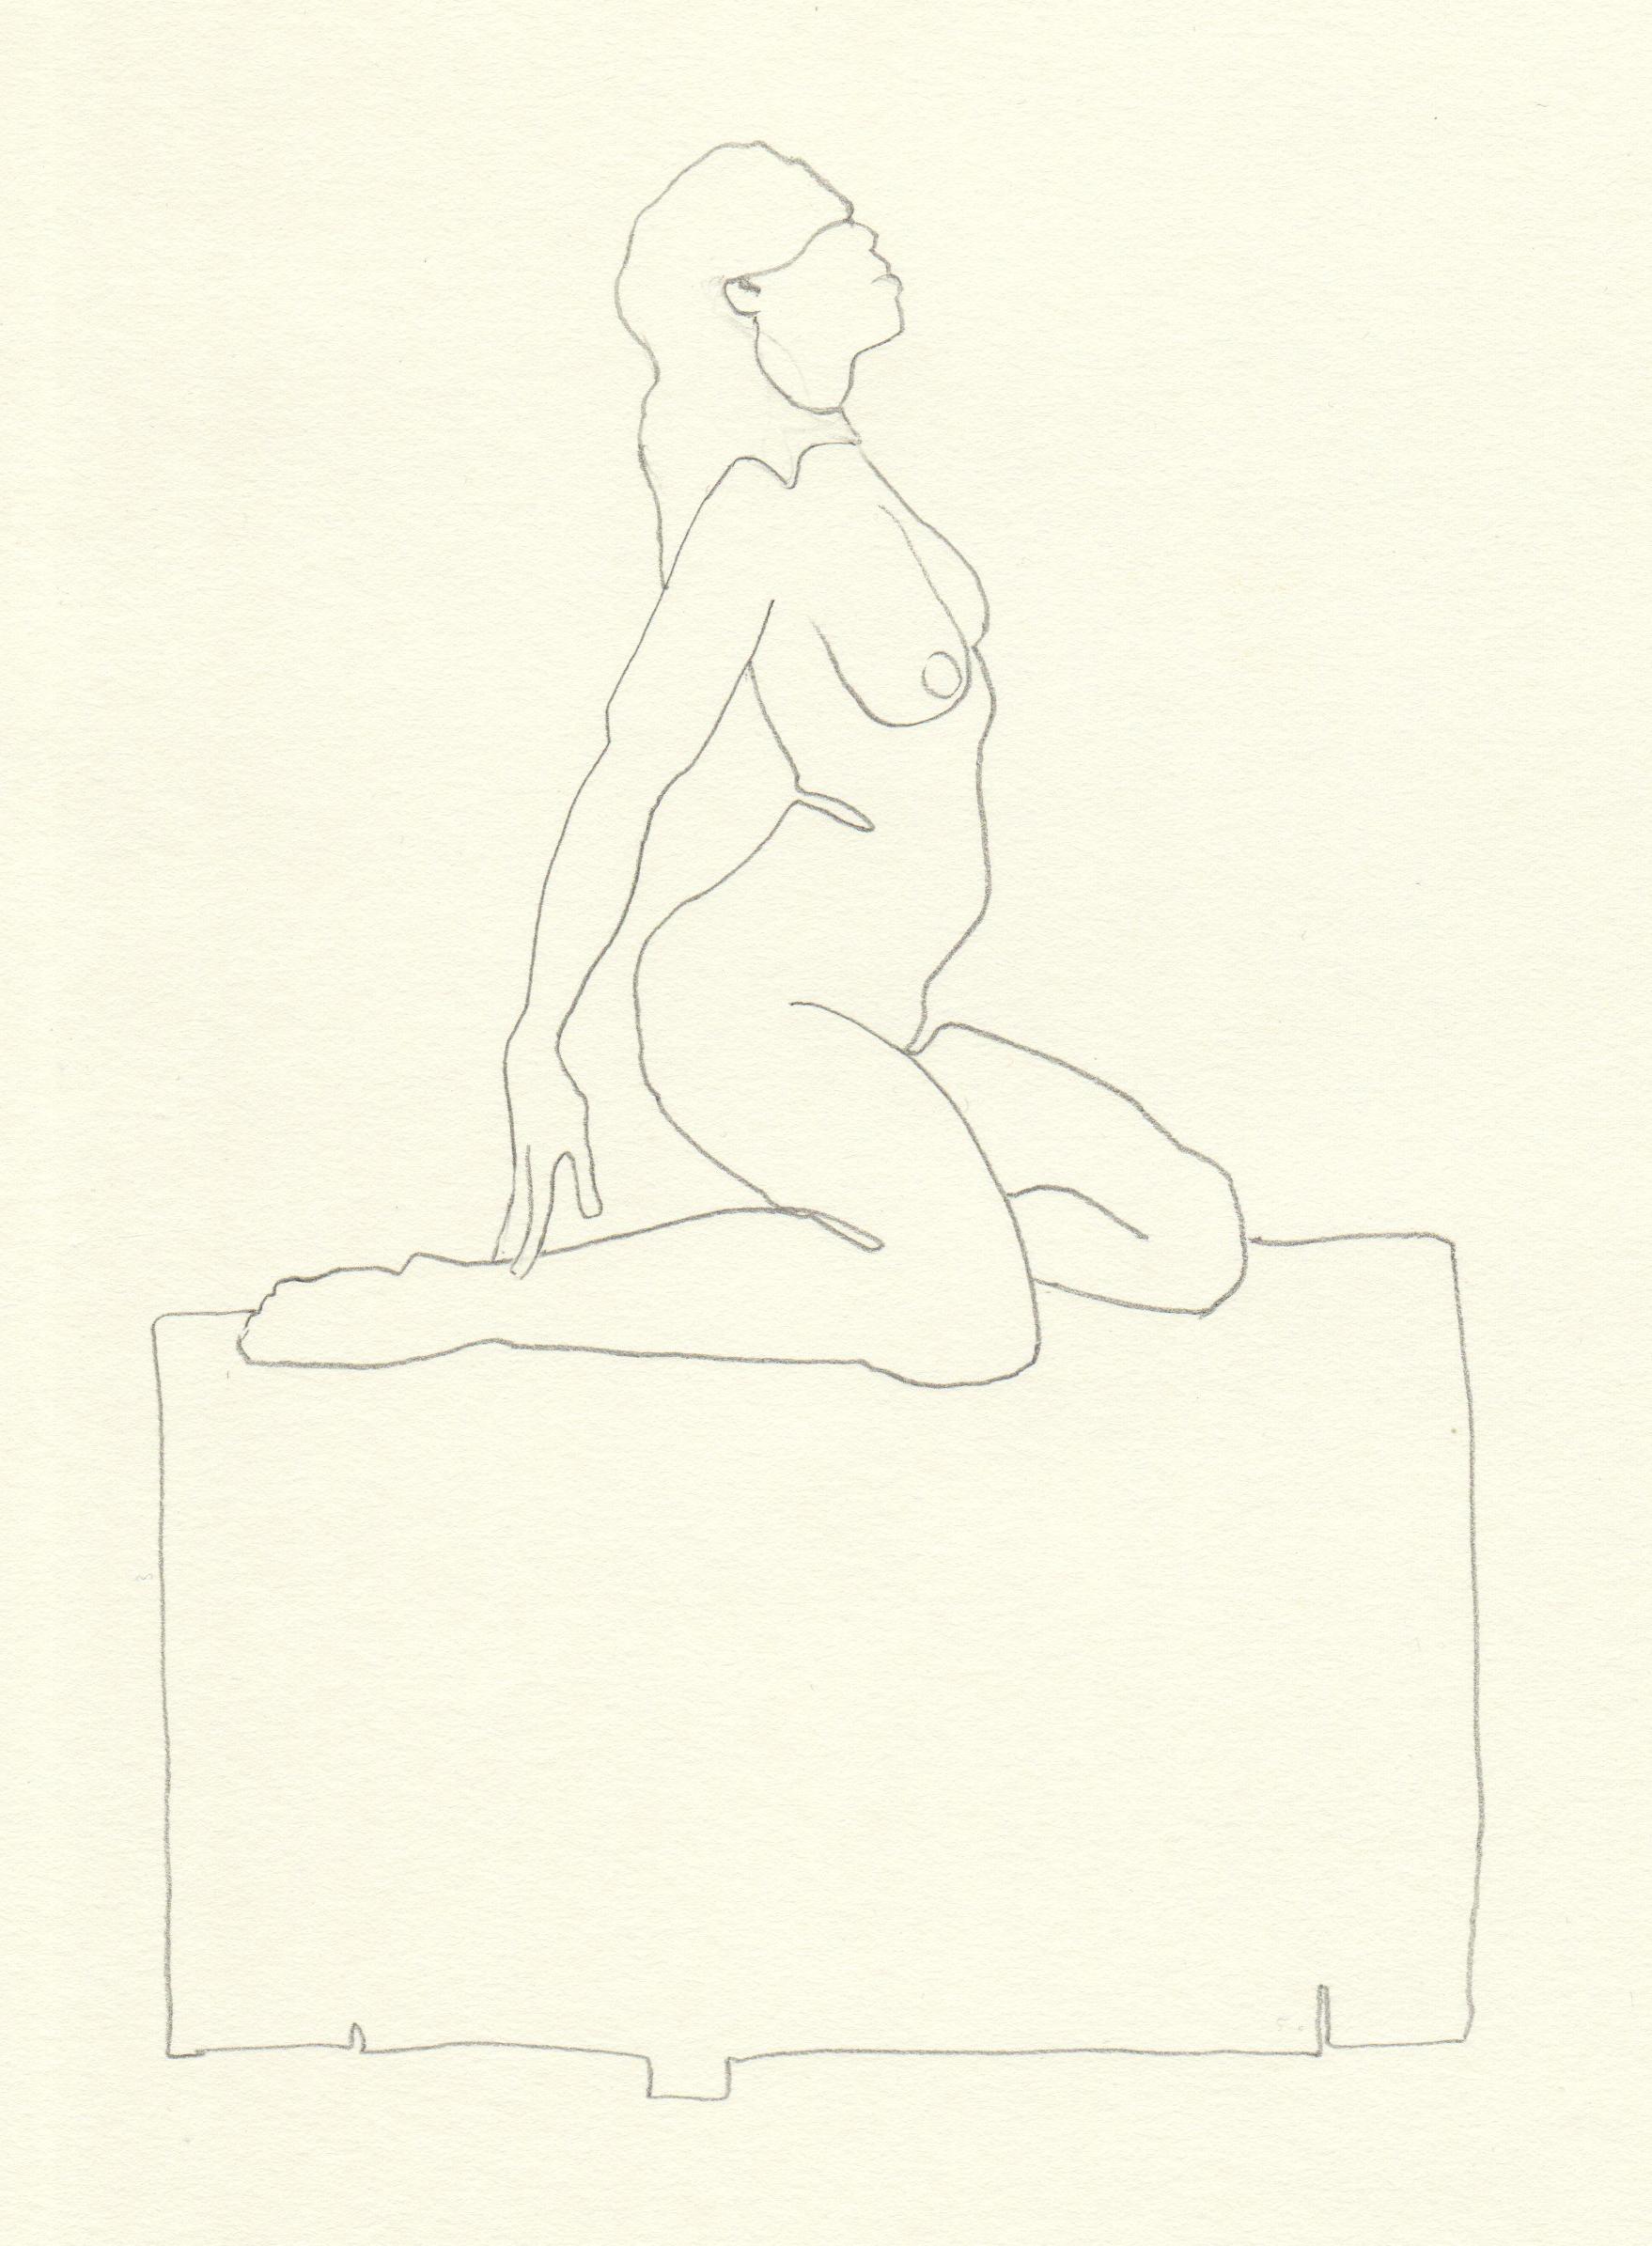 2012_Sketch_F-Beudin_063